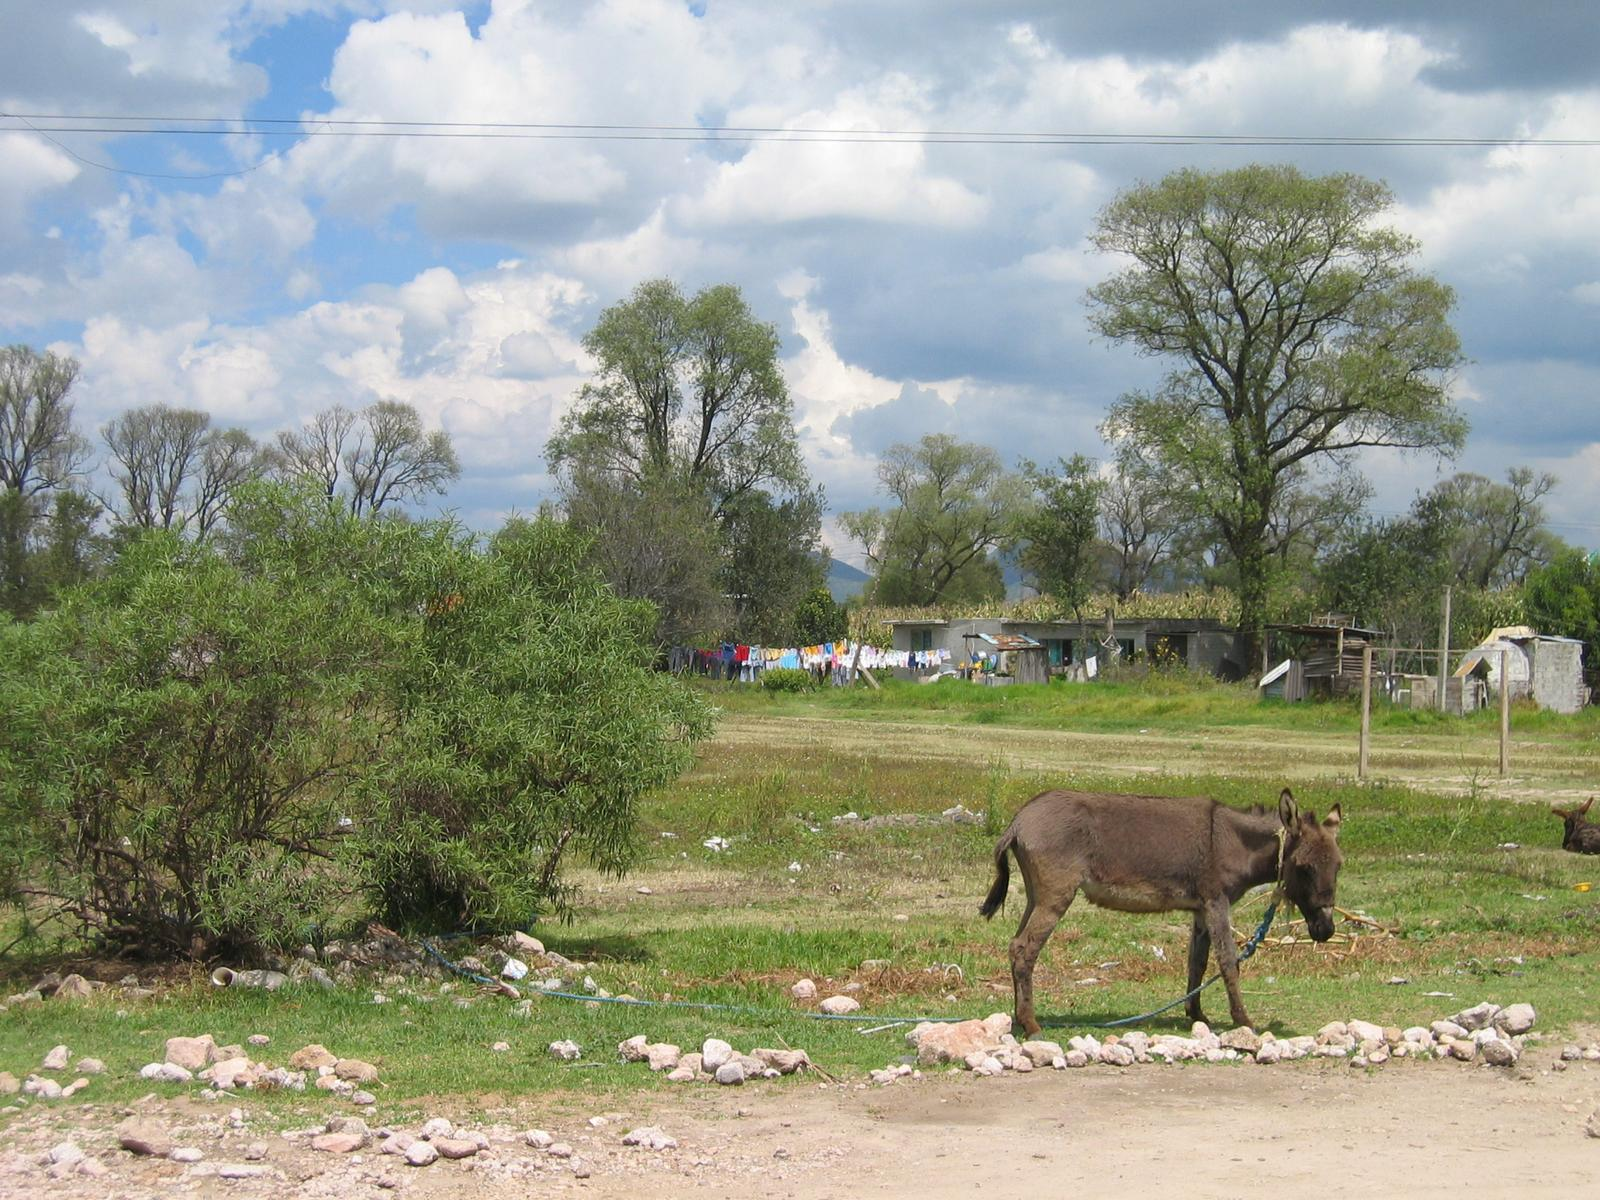 File:Ejido A-Tocuila Texcoco Mexico.jpg - Wikimedia Commons